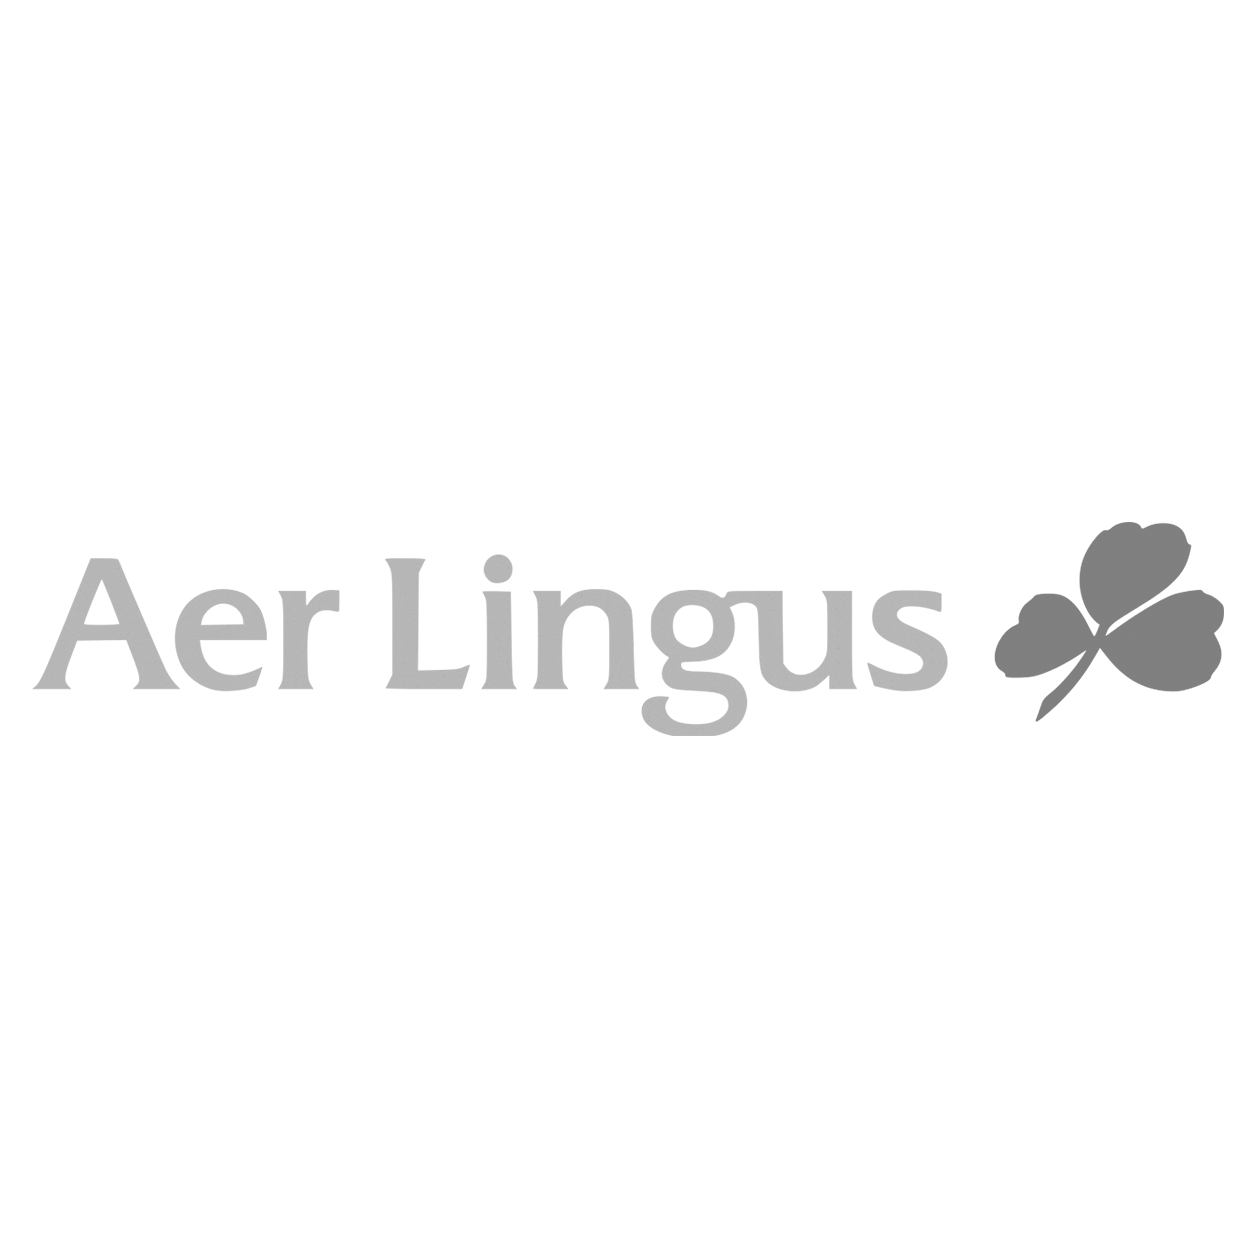 AerLingus_bw.png